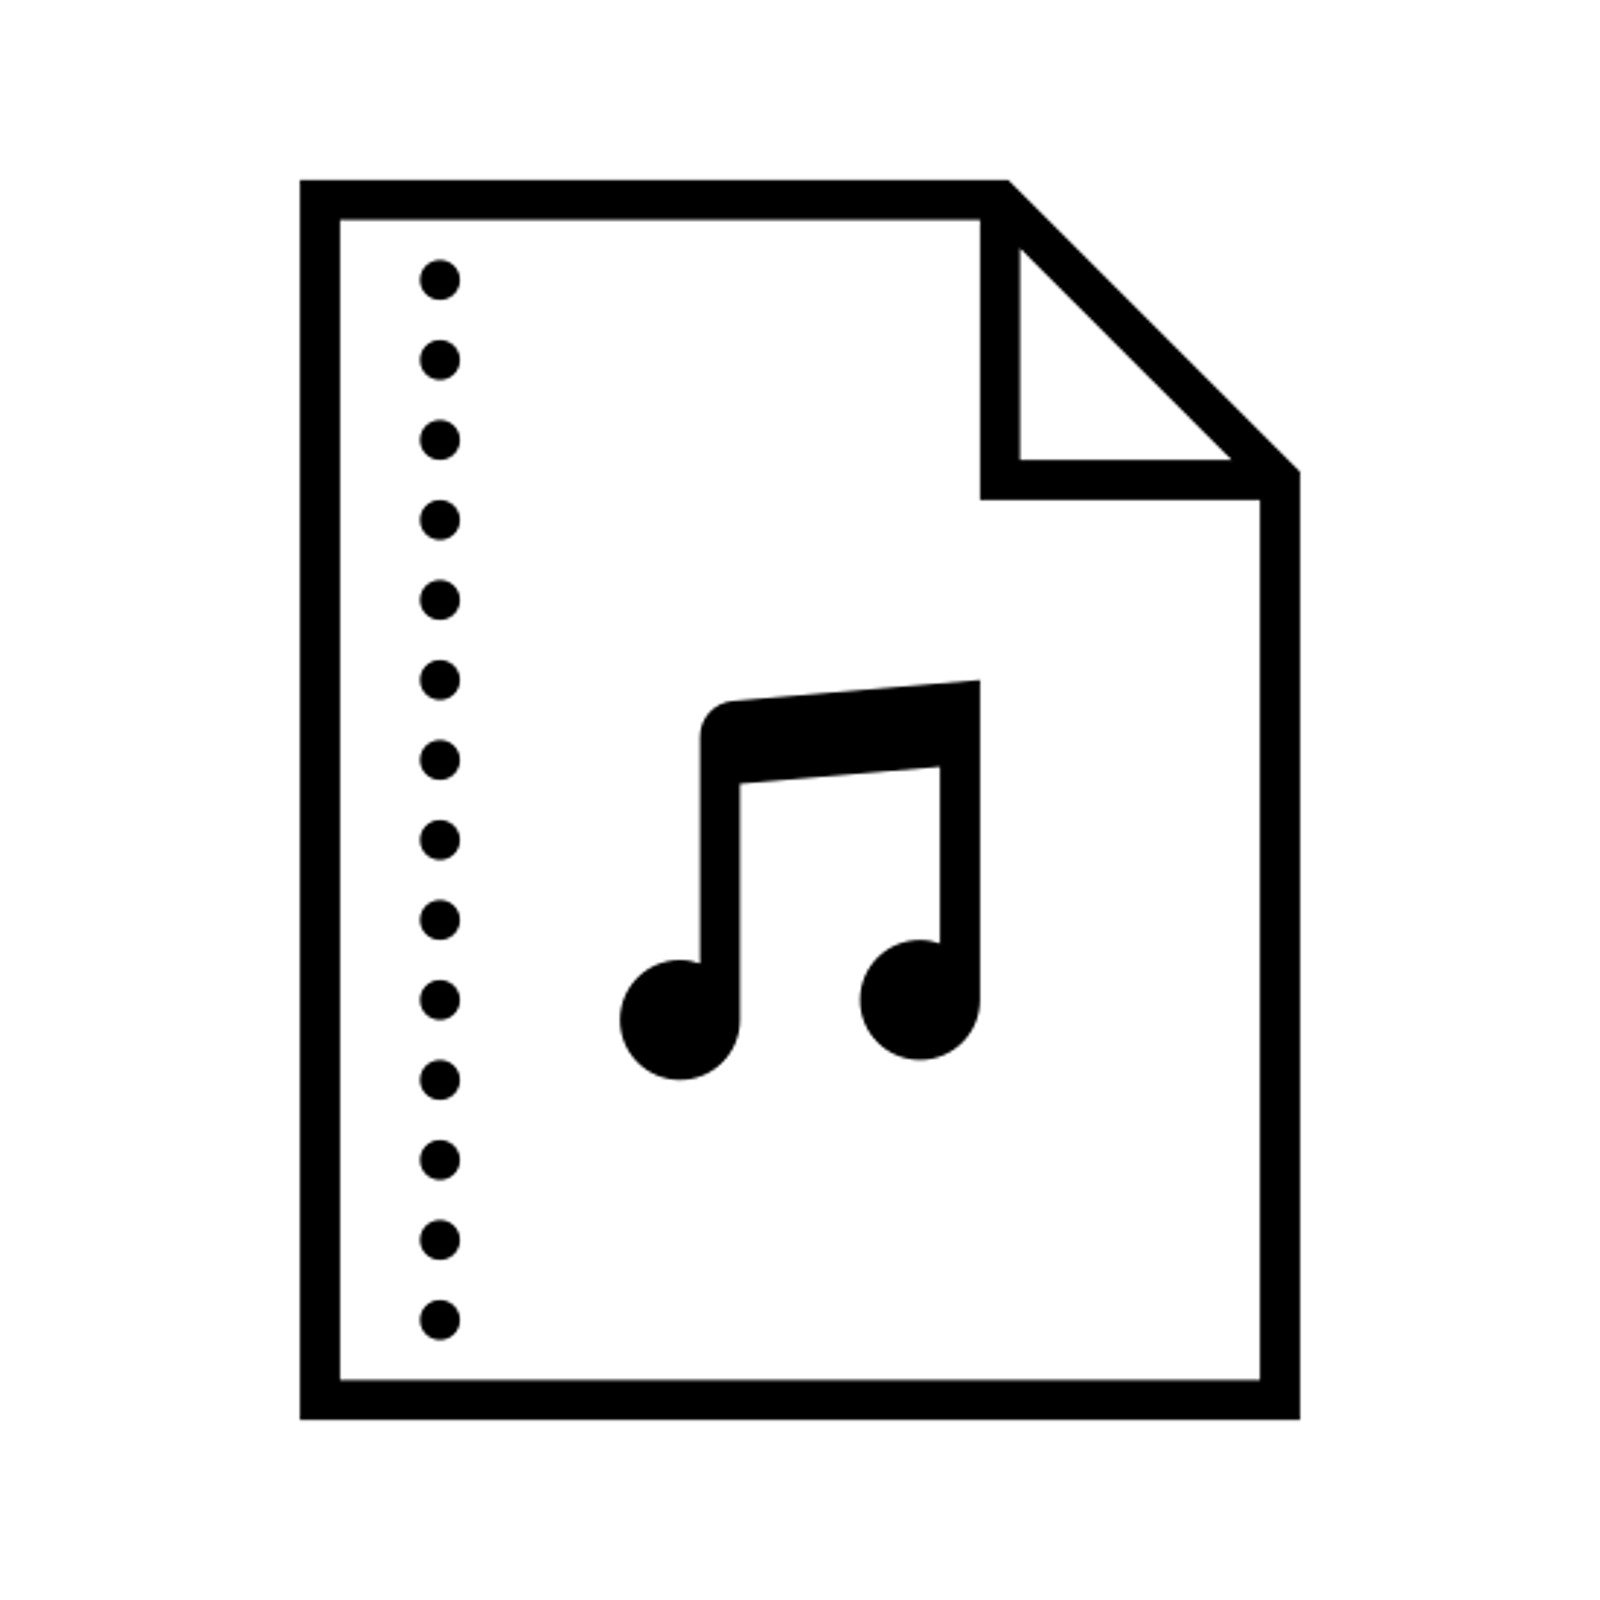 Archivo de audio icon